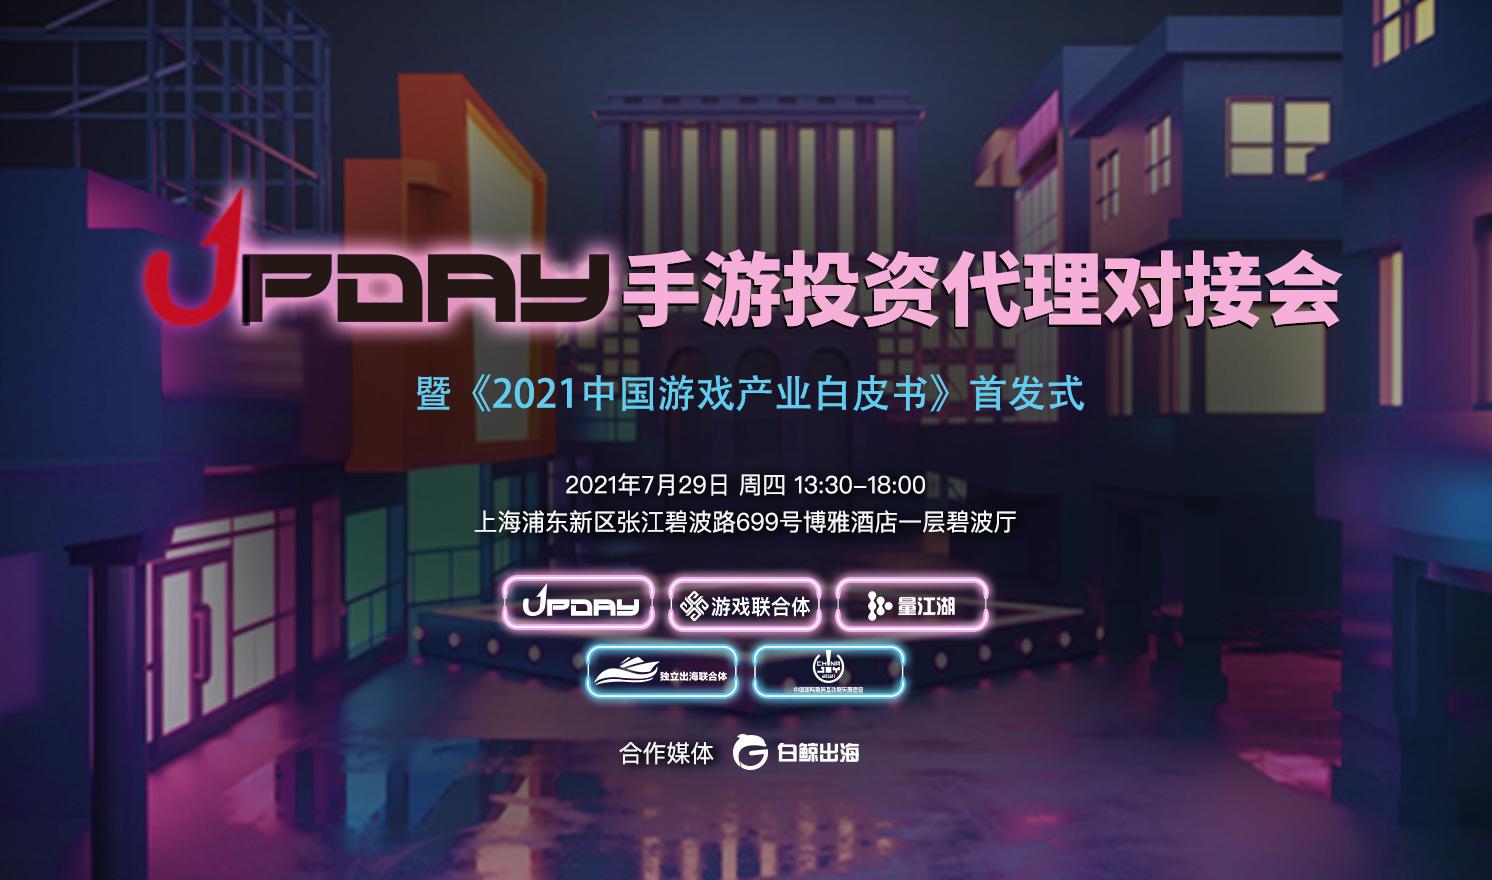 UPDAY 手游投资代理对接会-暨《2021中国游戏产业白皮书》首发式(2021-07-29)